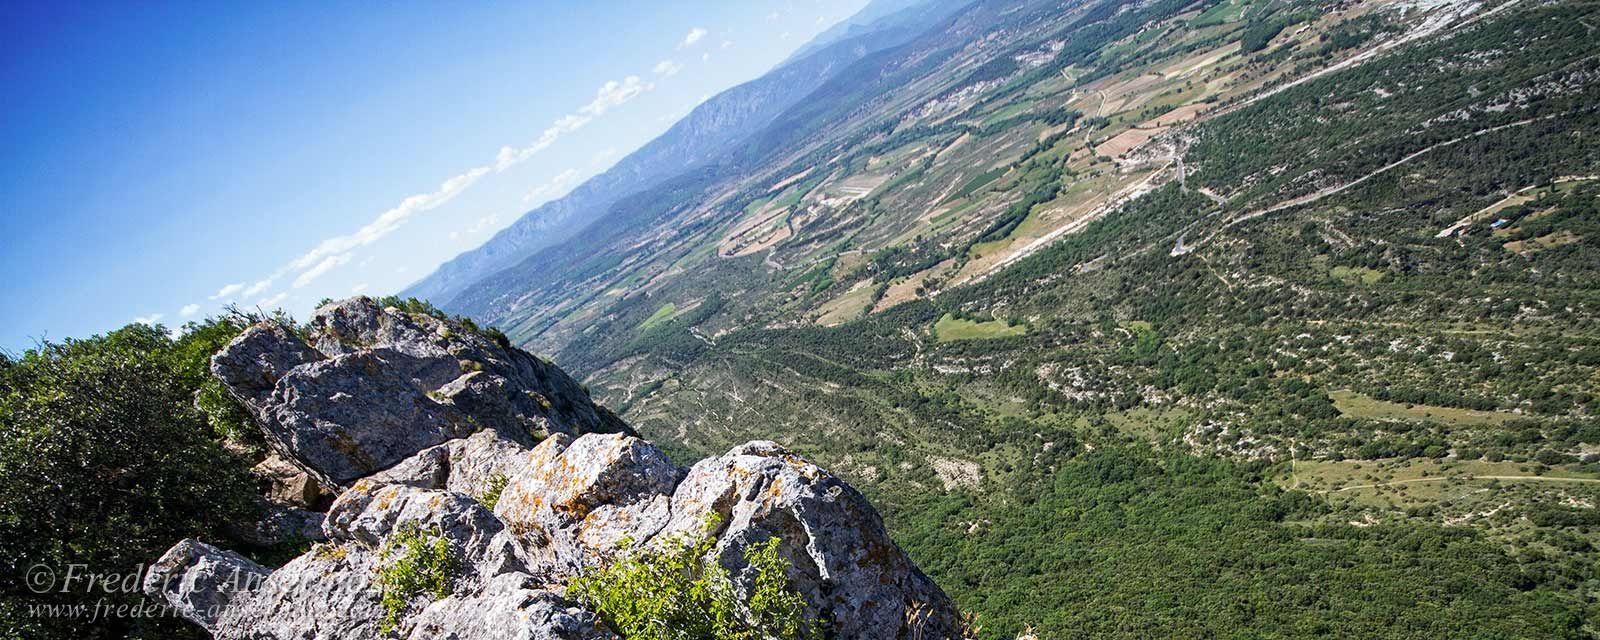 Pic Saint Loup Herault France Pic Saint Loup Roussillon France Herault